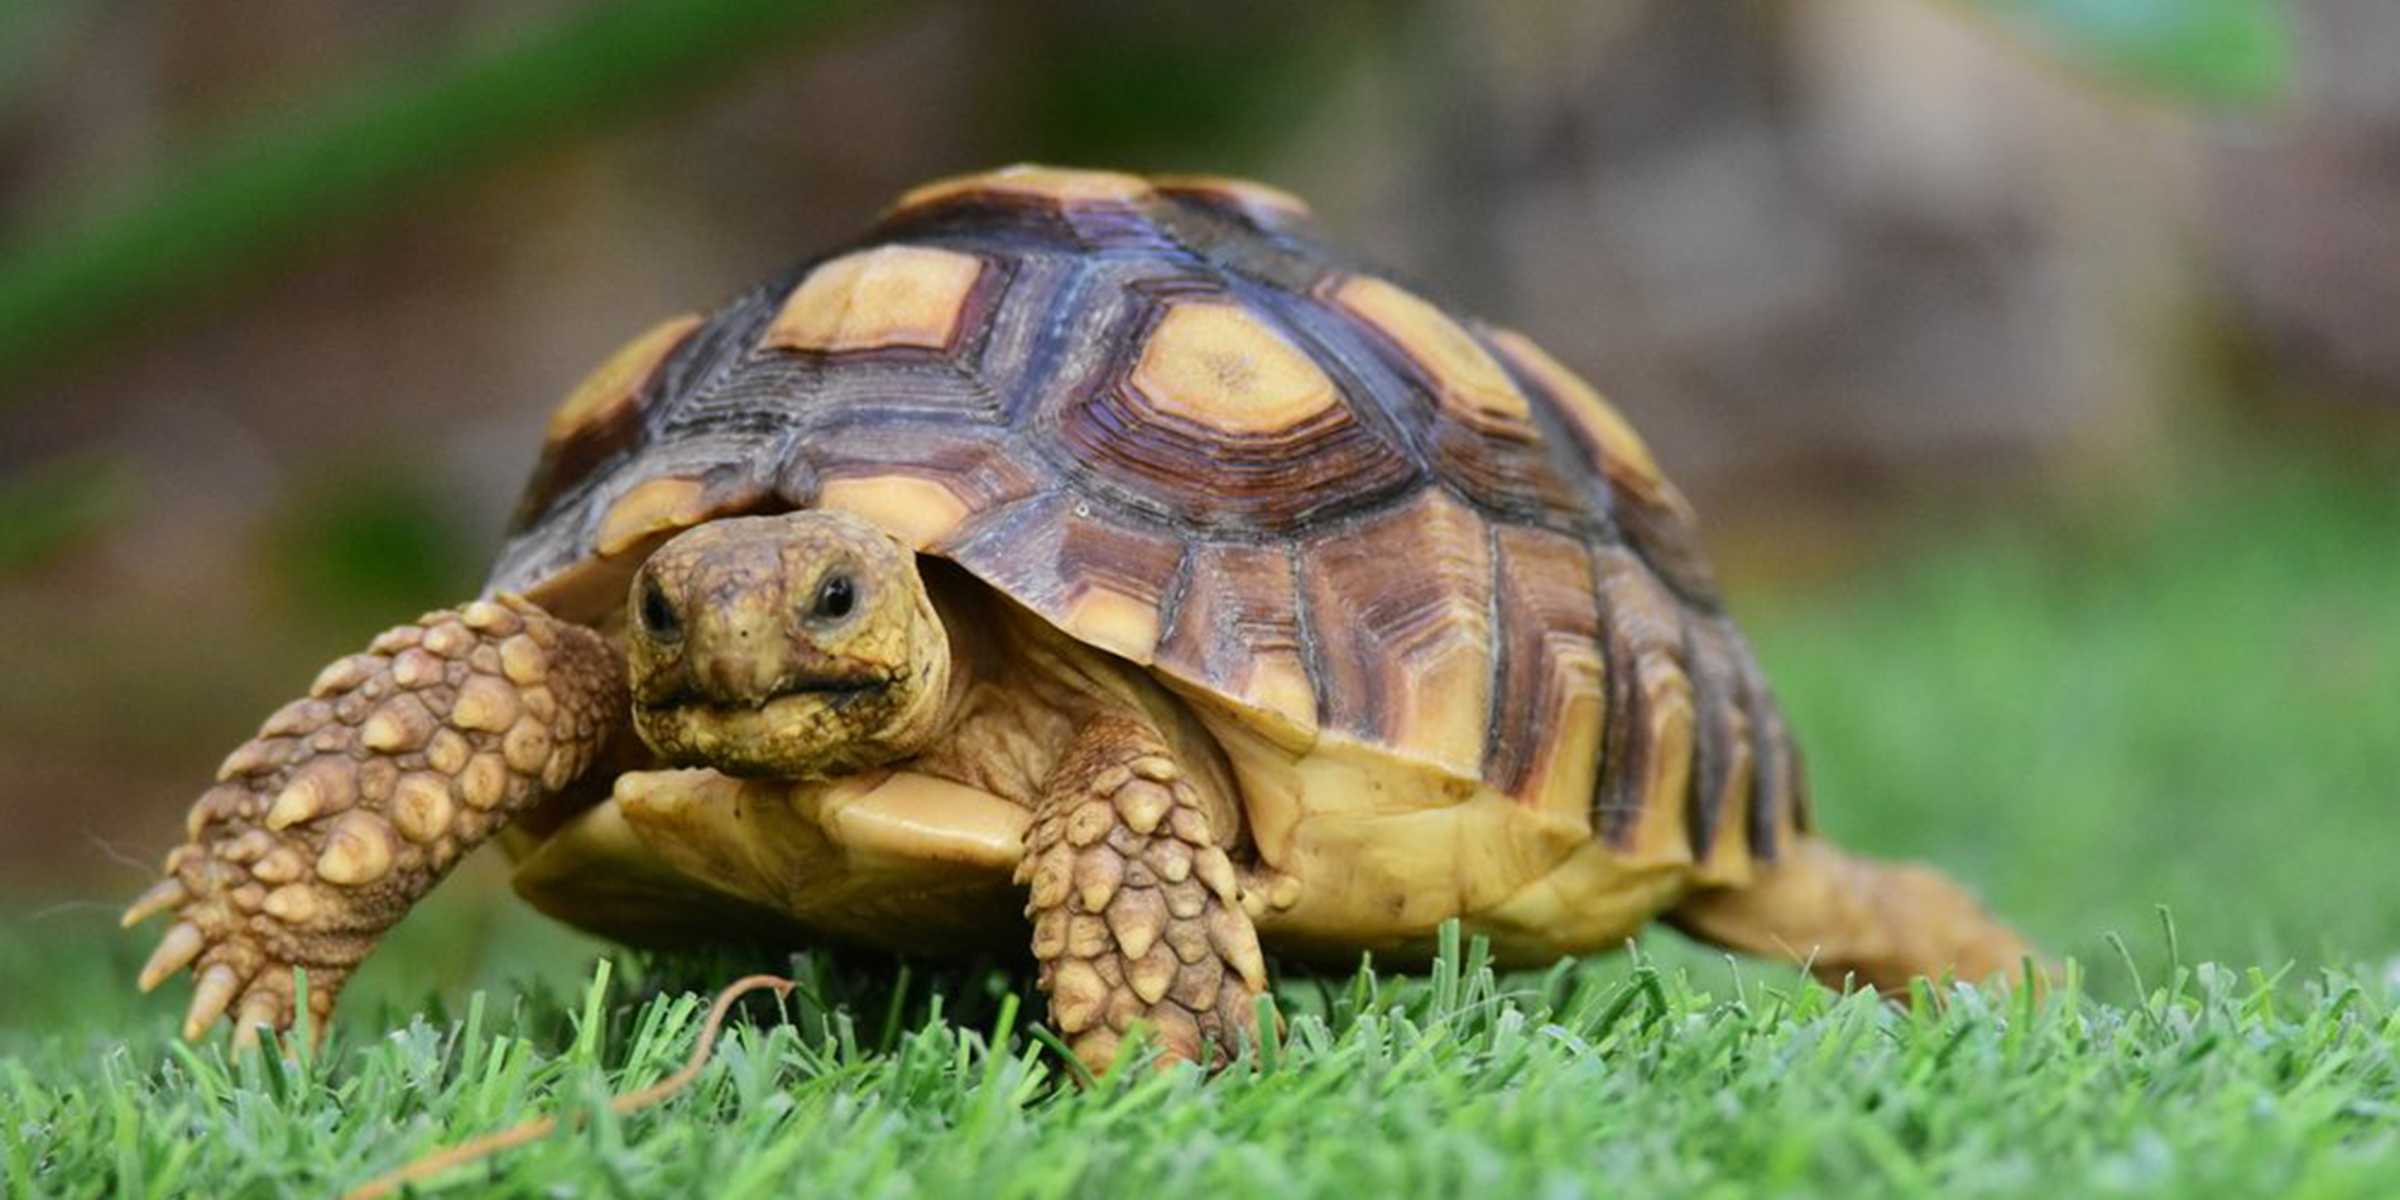 Salmonella outbreak across 13 states linked to pet turtles